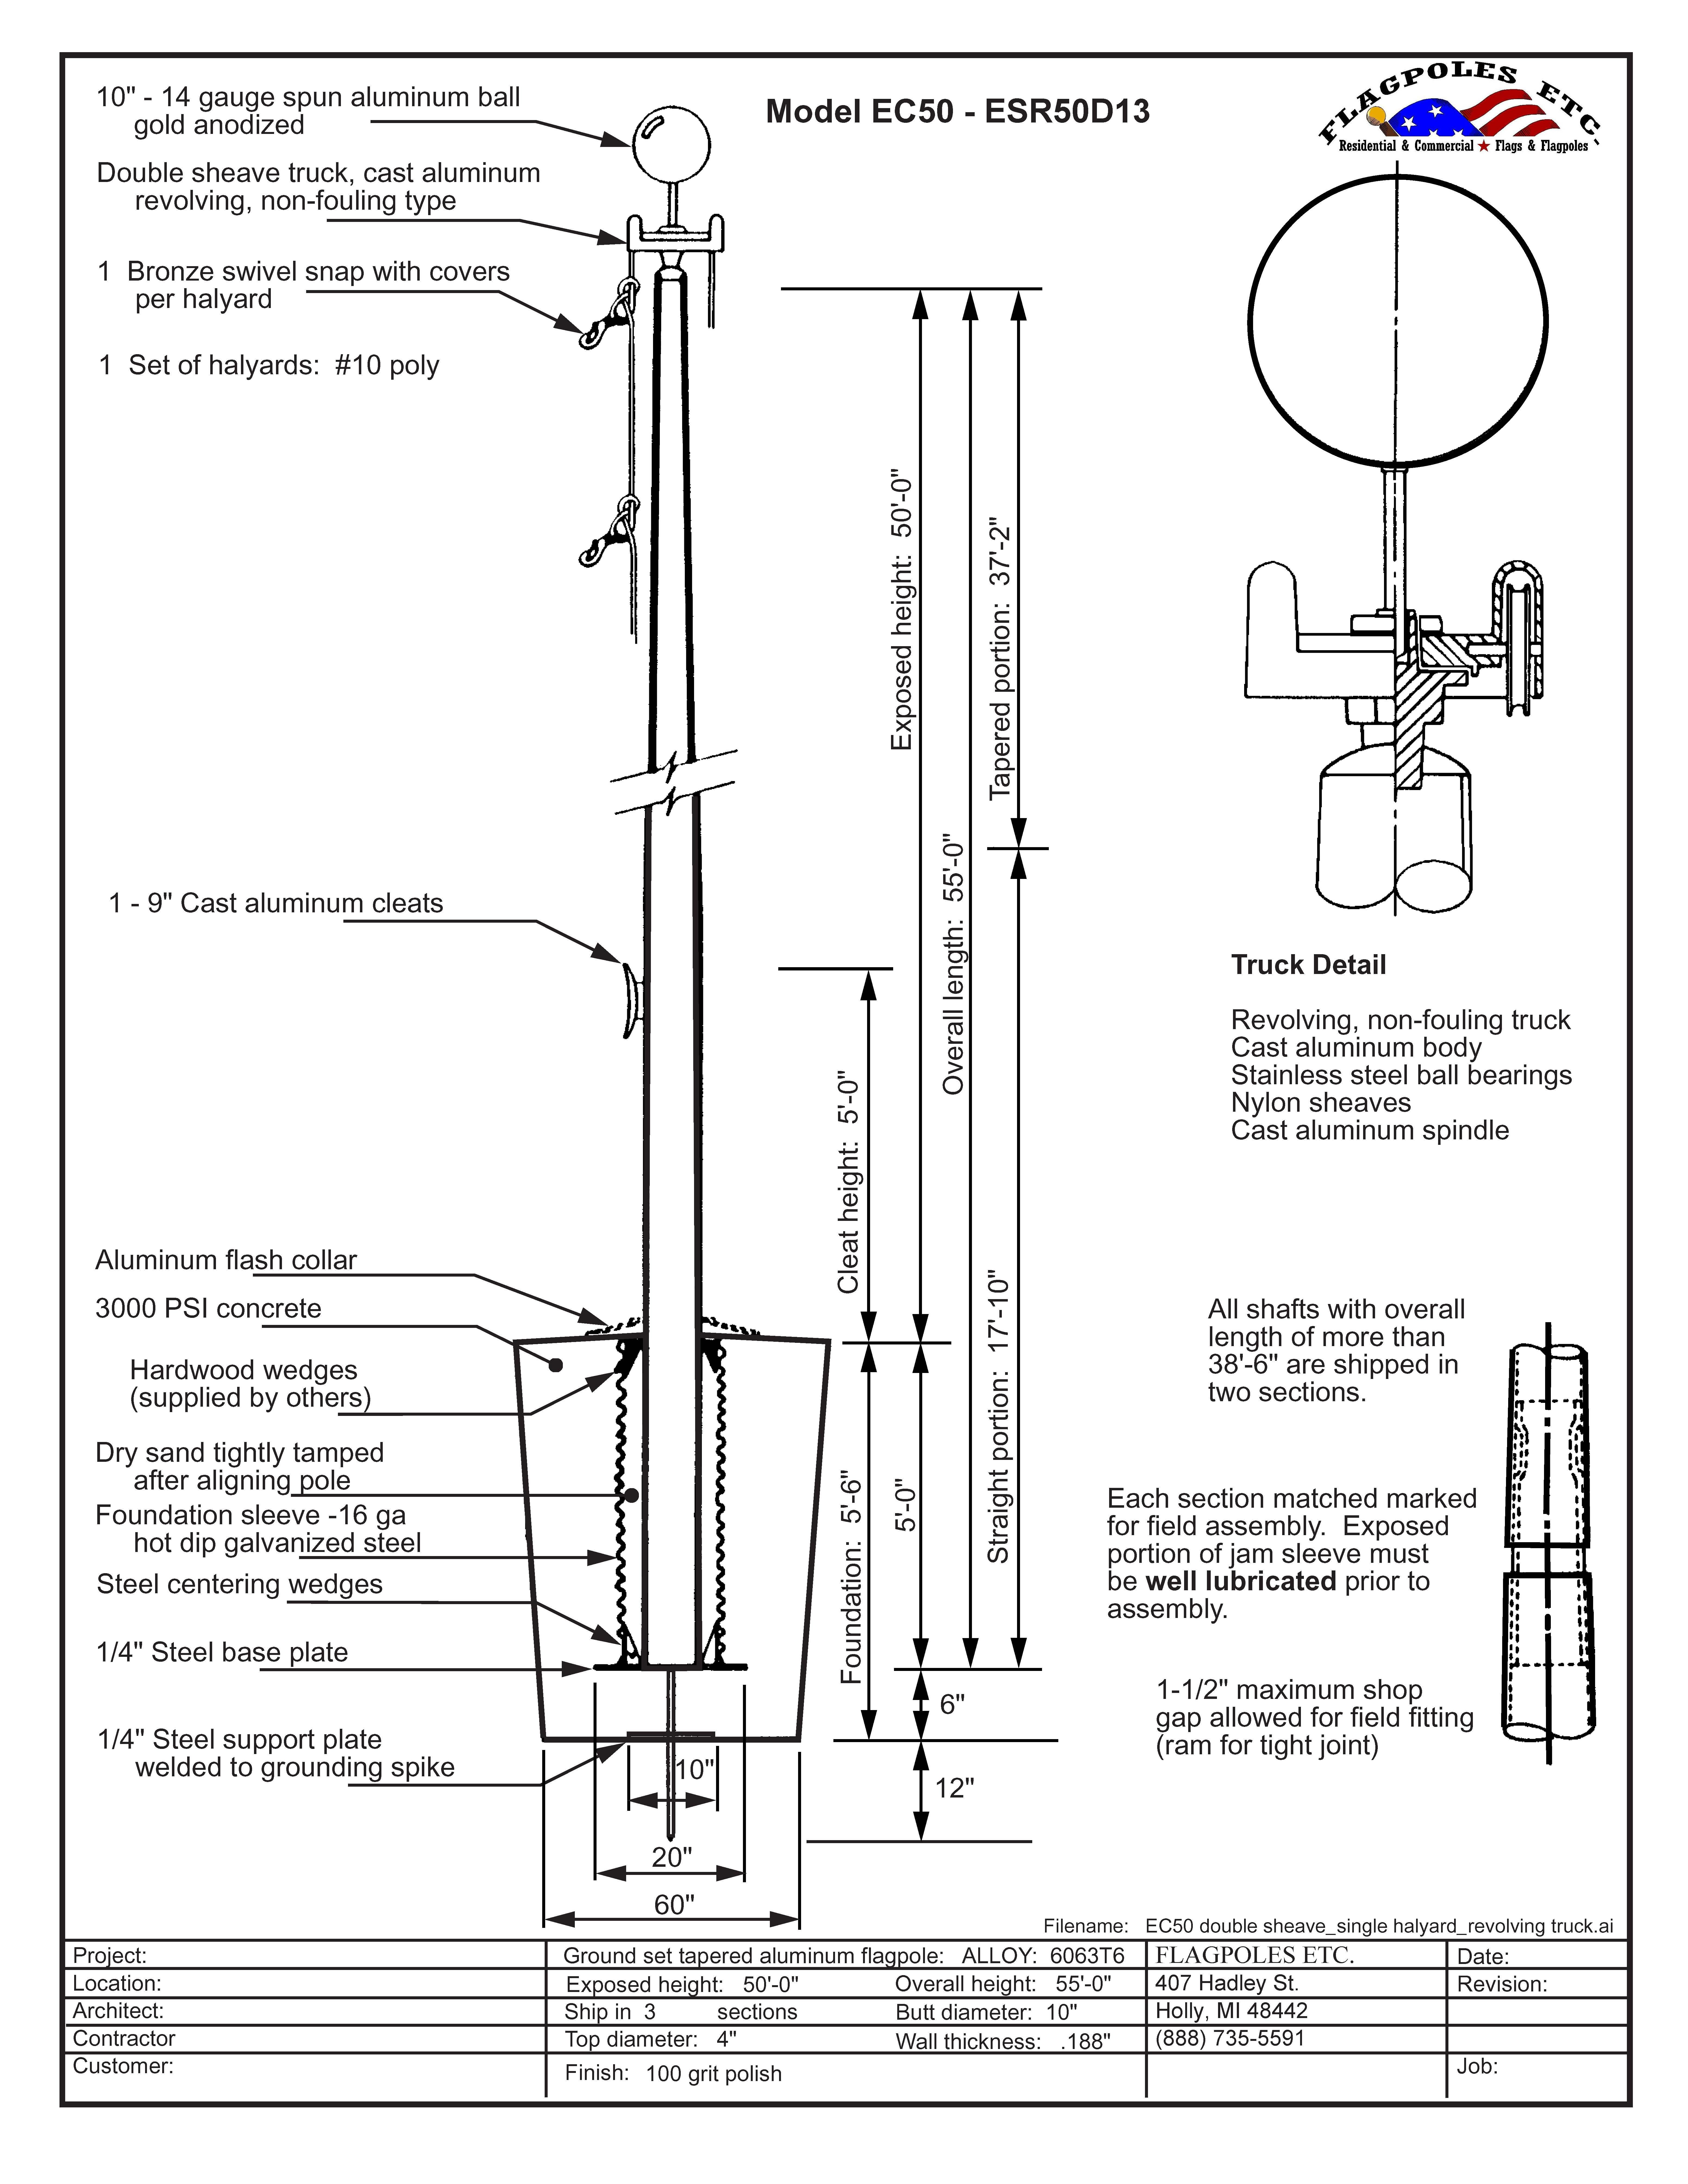 50 Foot Aluminum X 10 Inch External Halyard Flag Pole Made